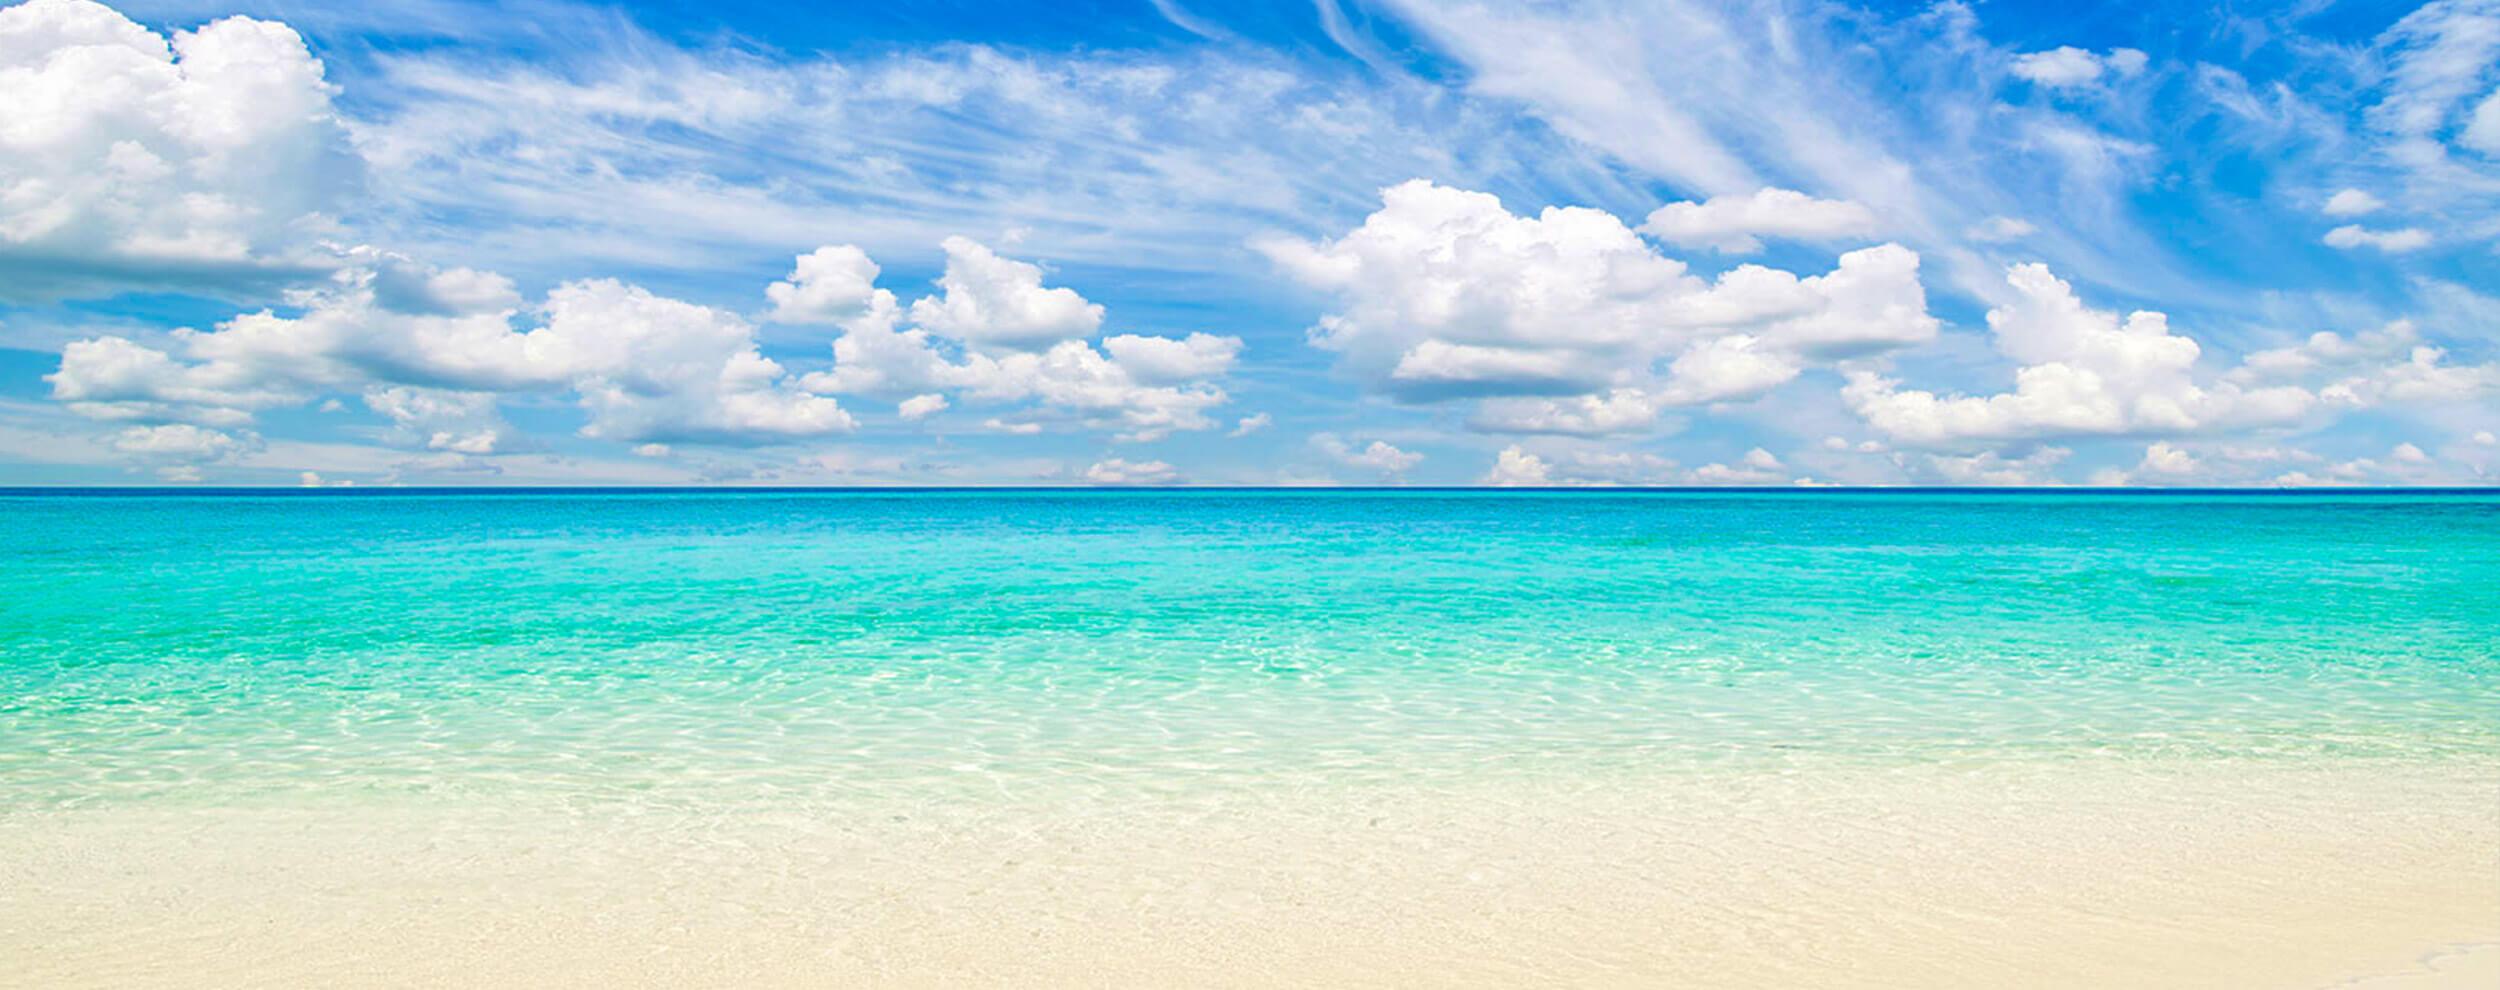 blue ocean beach water